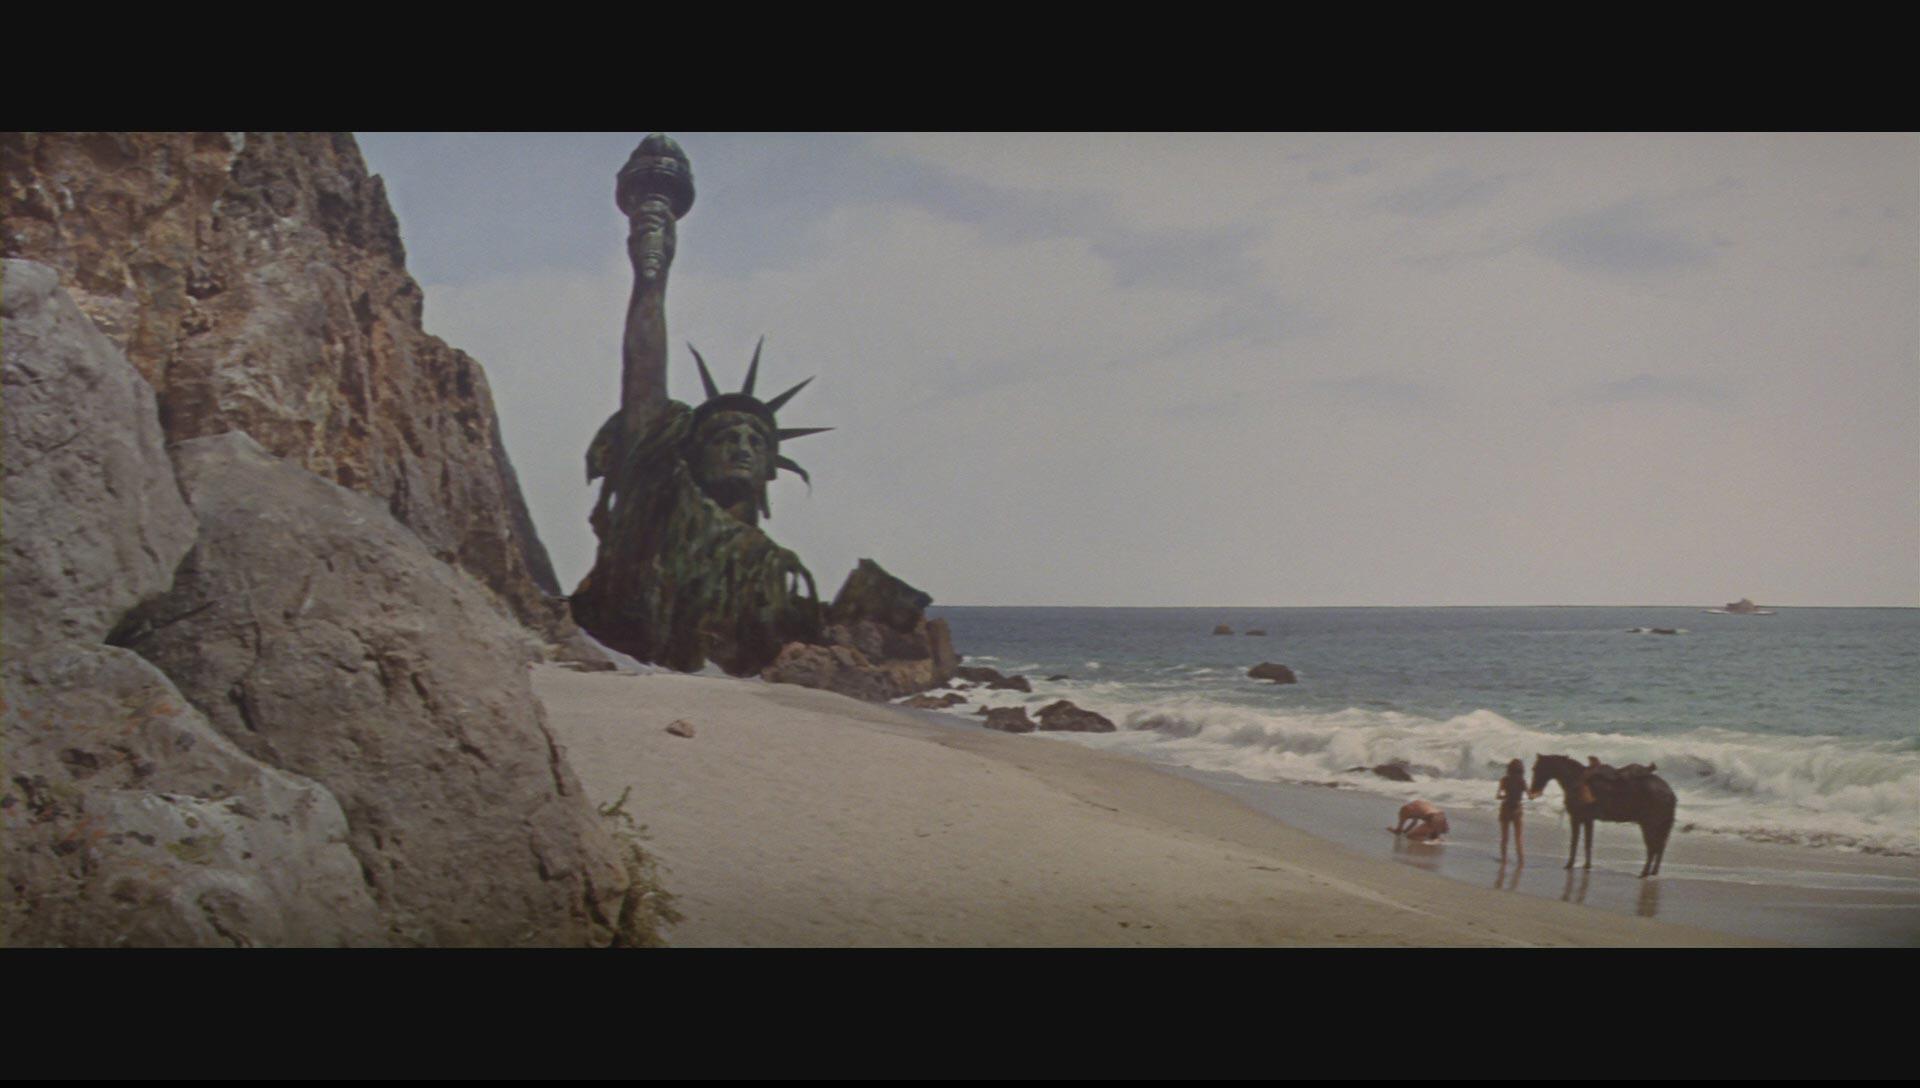 https://i2.wp.com/www.originalprop.com/blog/wp-content/uploads/2009/03/planet-of-the-apes-statue-of-liberty-blu-ray-disc-screencap-hd-1080p-05.jpg